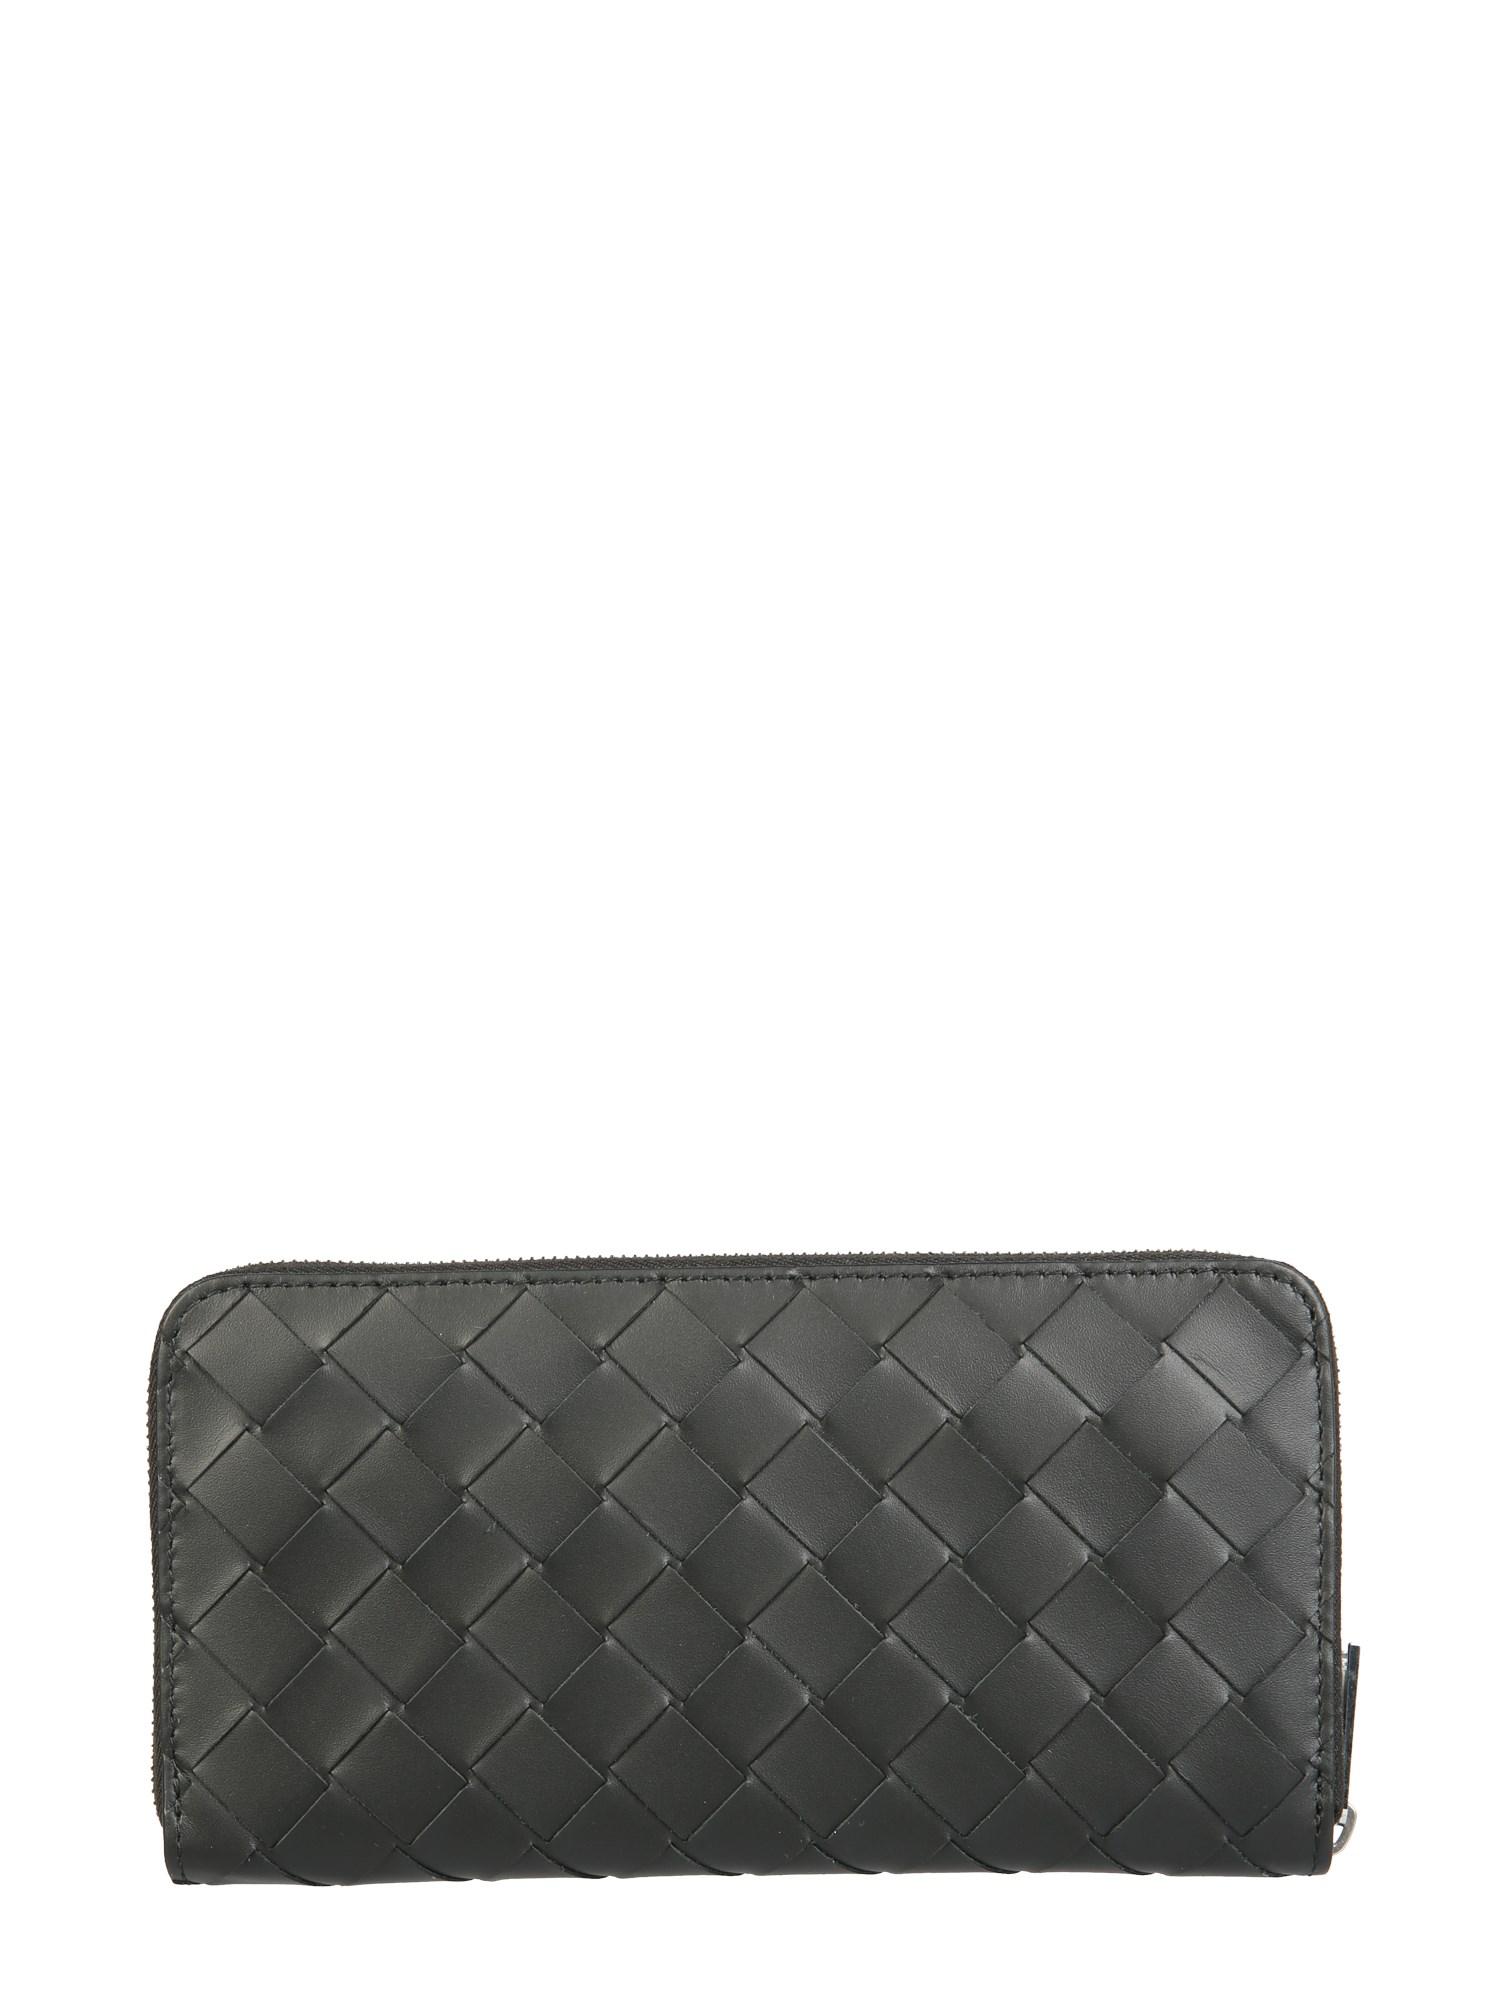 bottega veneta wallet with zip